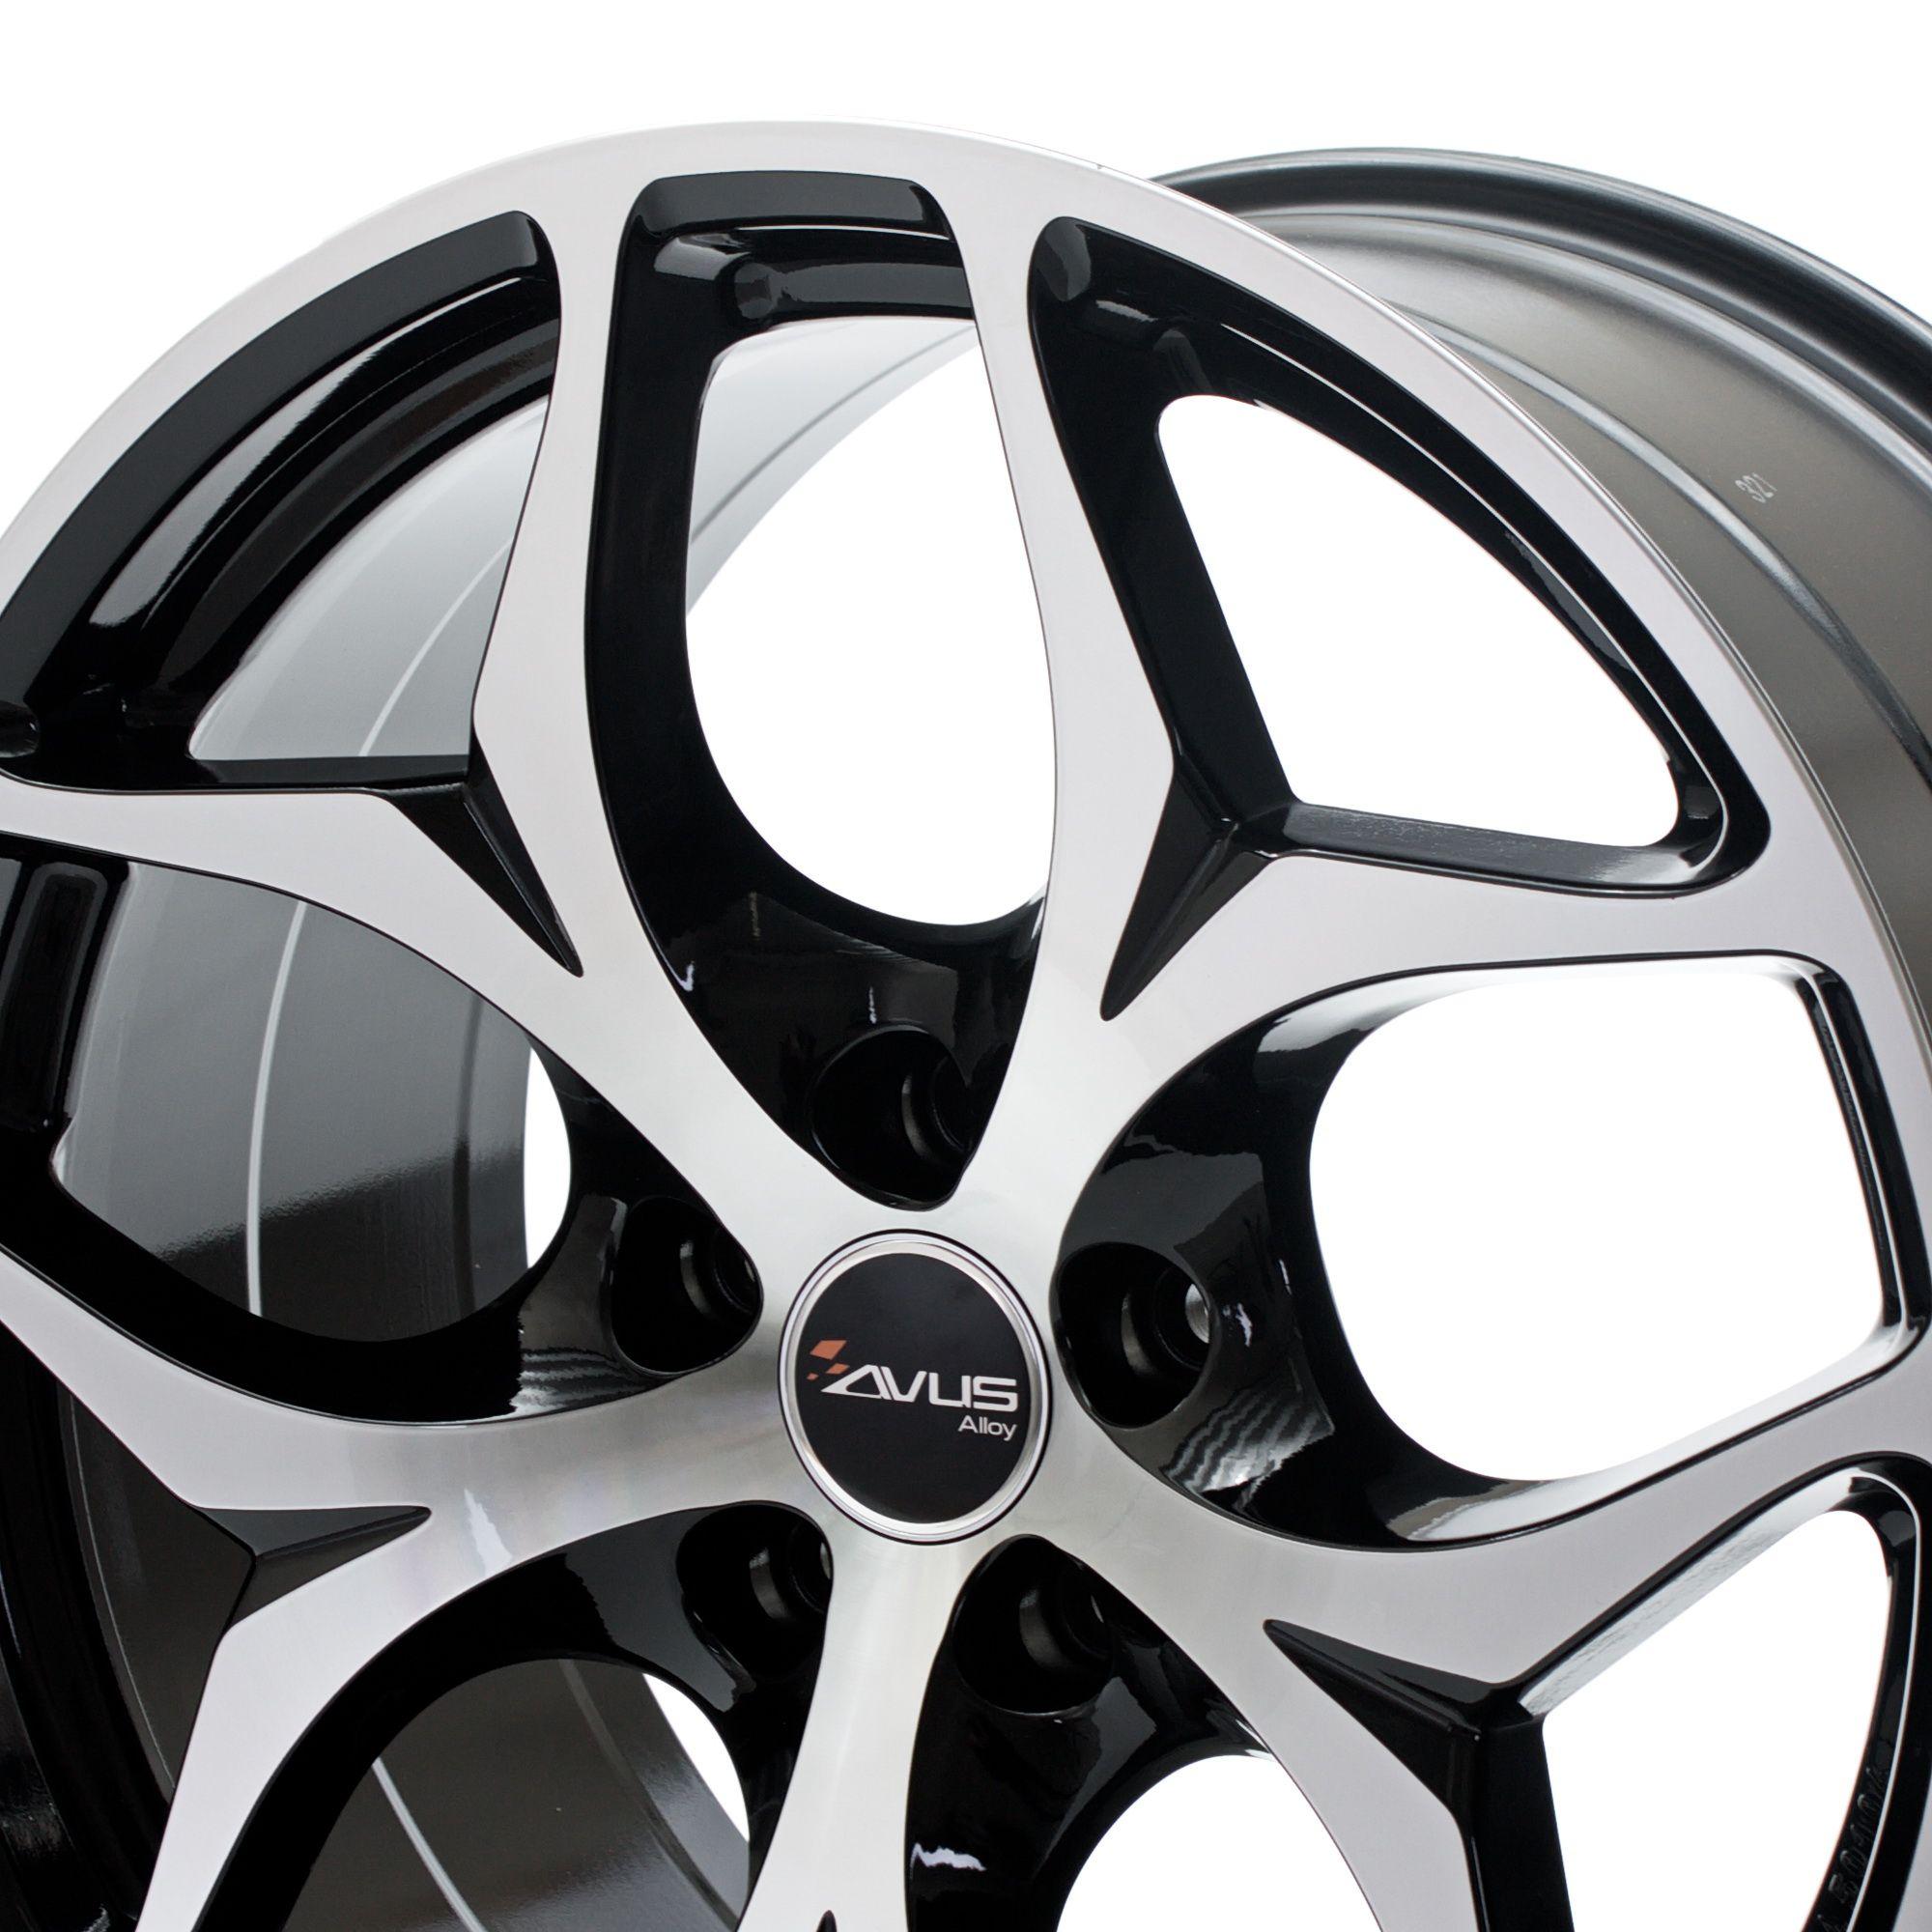 avus racing ac mb2 felgen black polished in 20 zoll. Black Bedroom Furniture Sets. Home Design Ideas